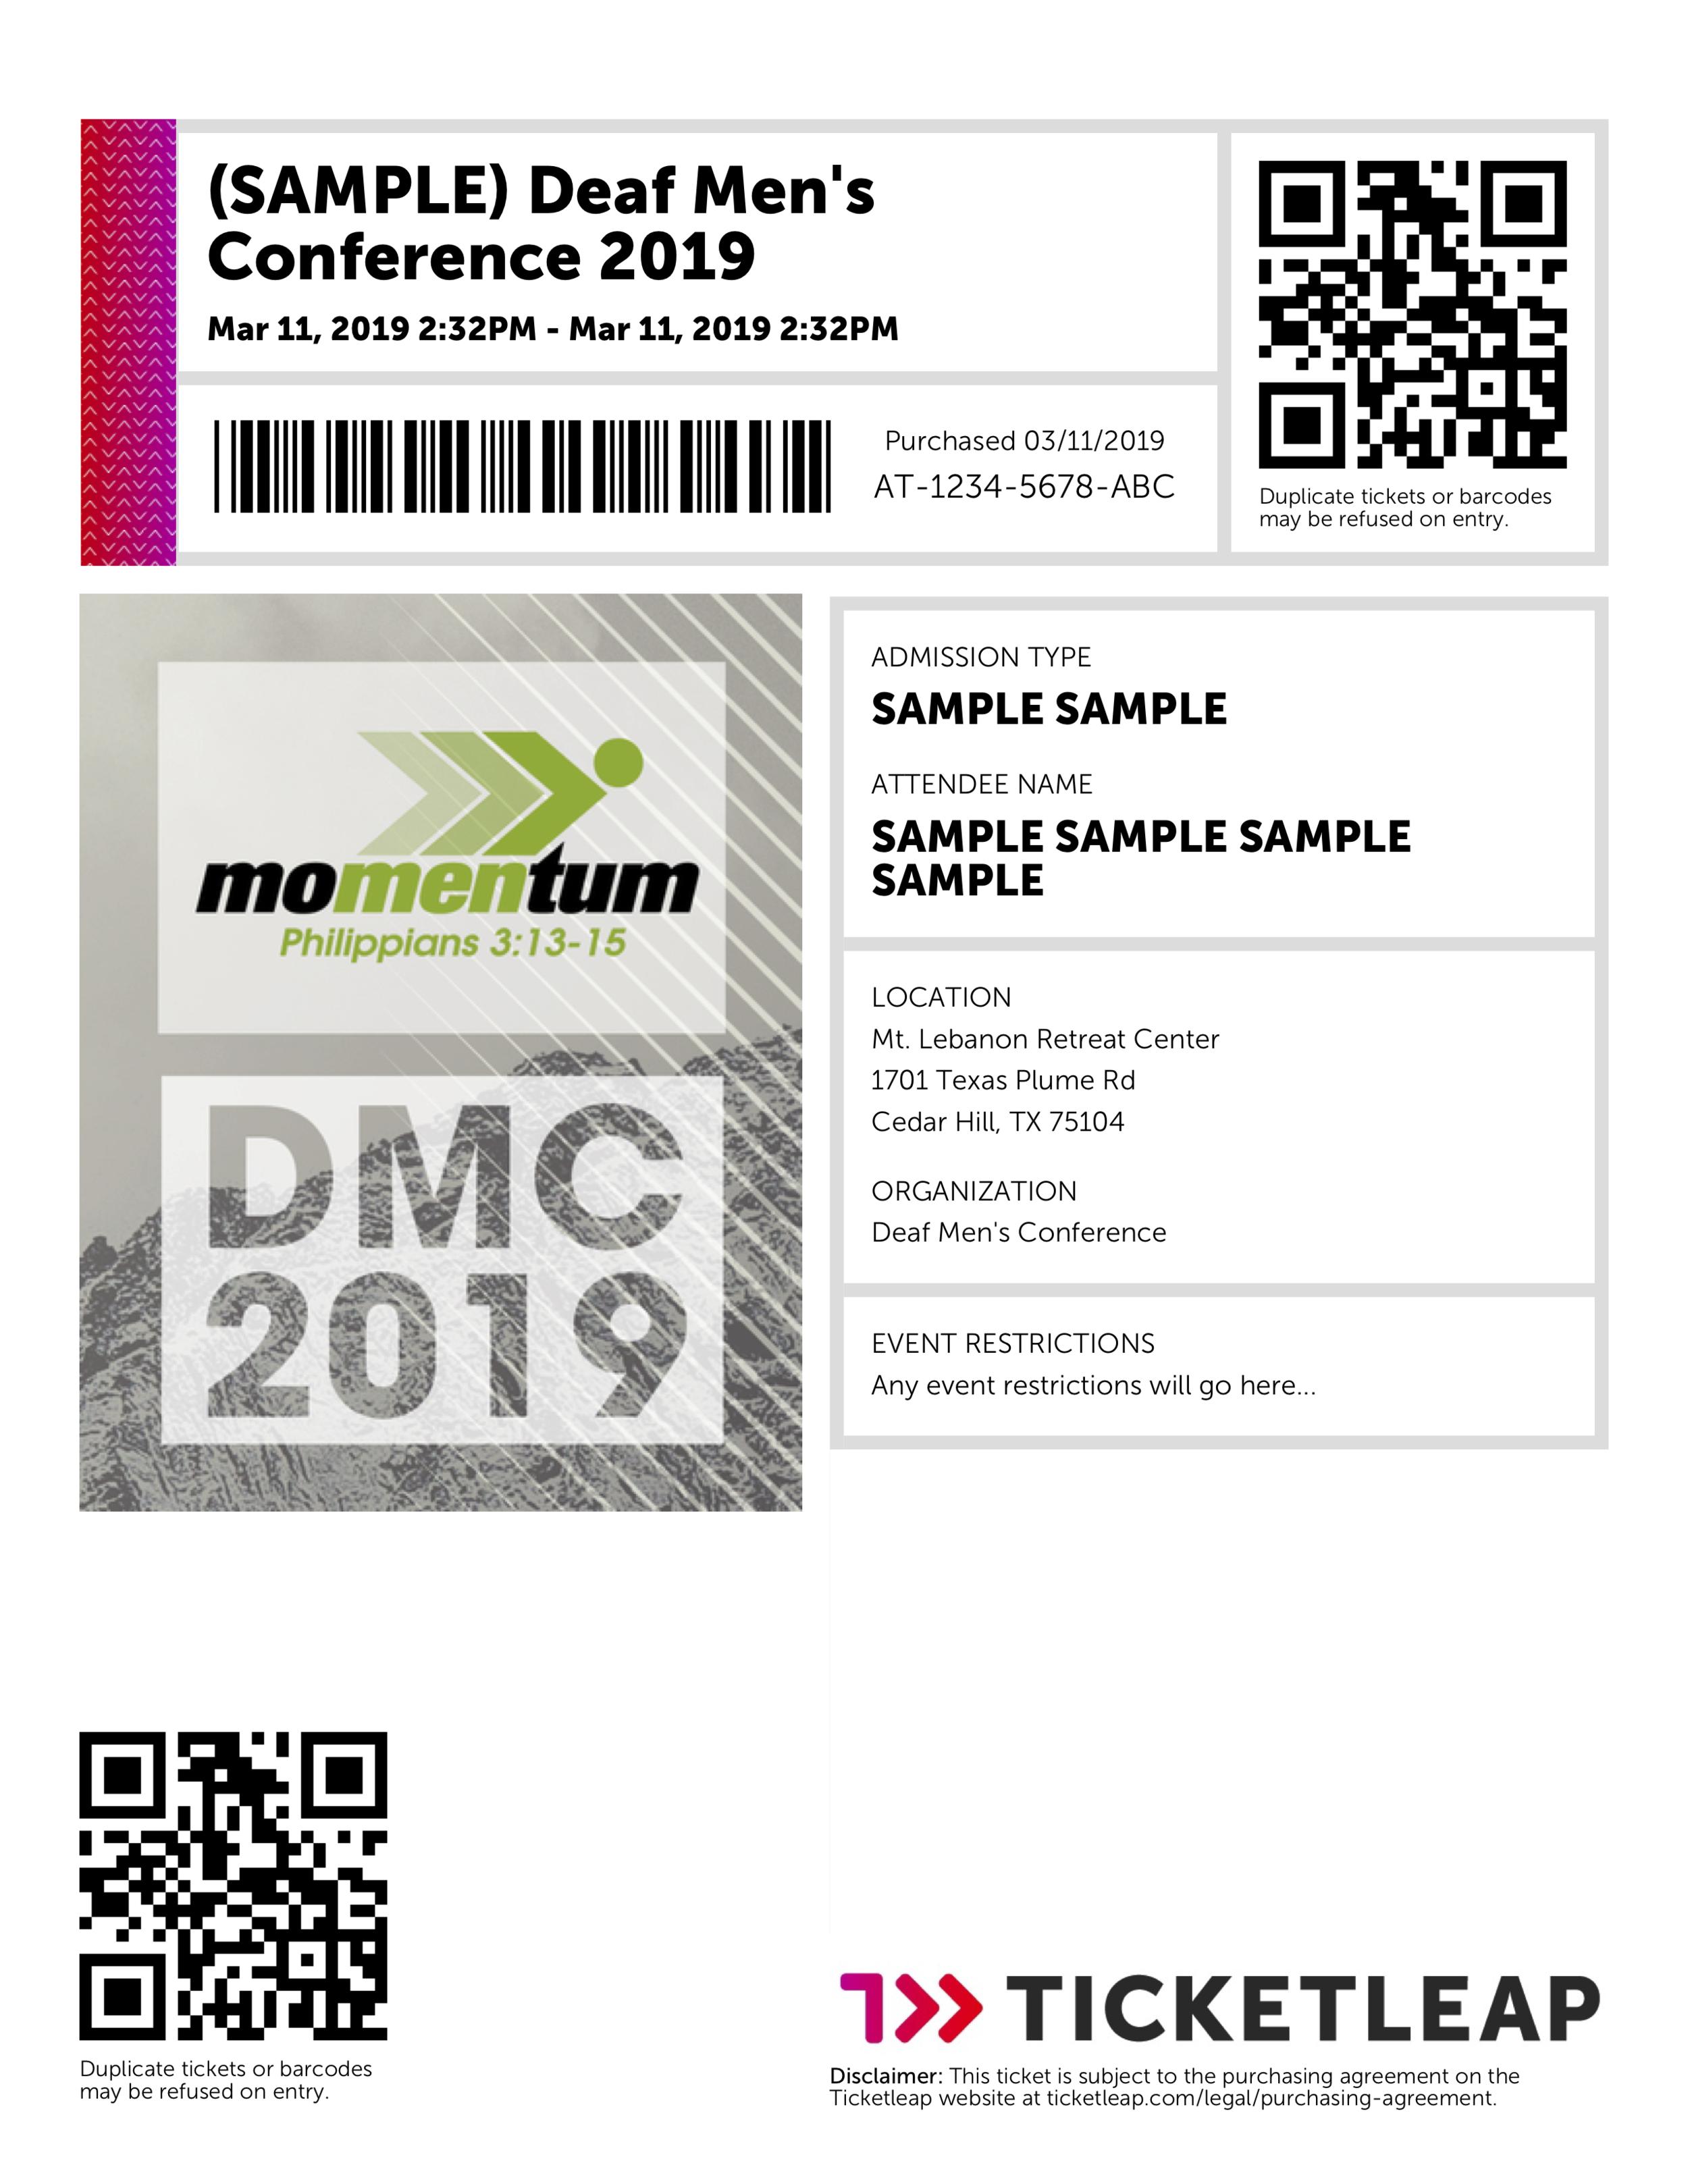 Sample Ticket